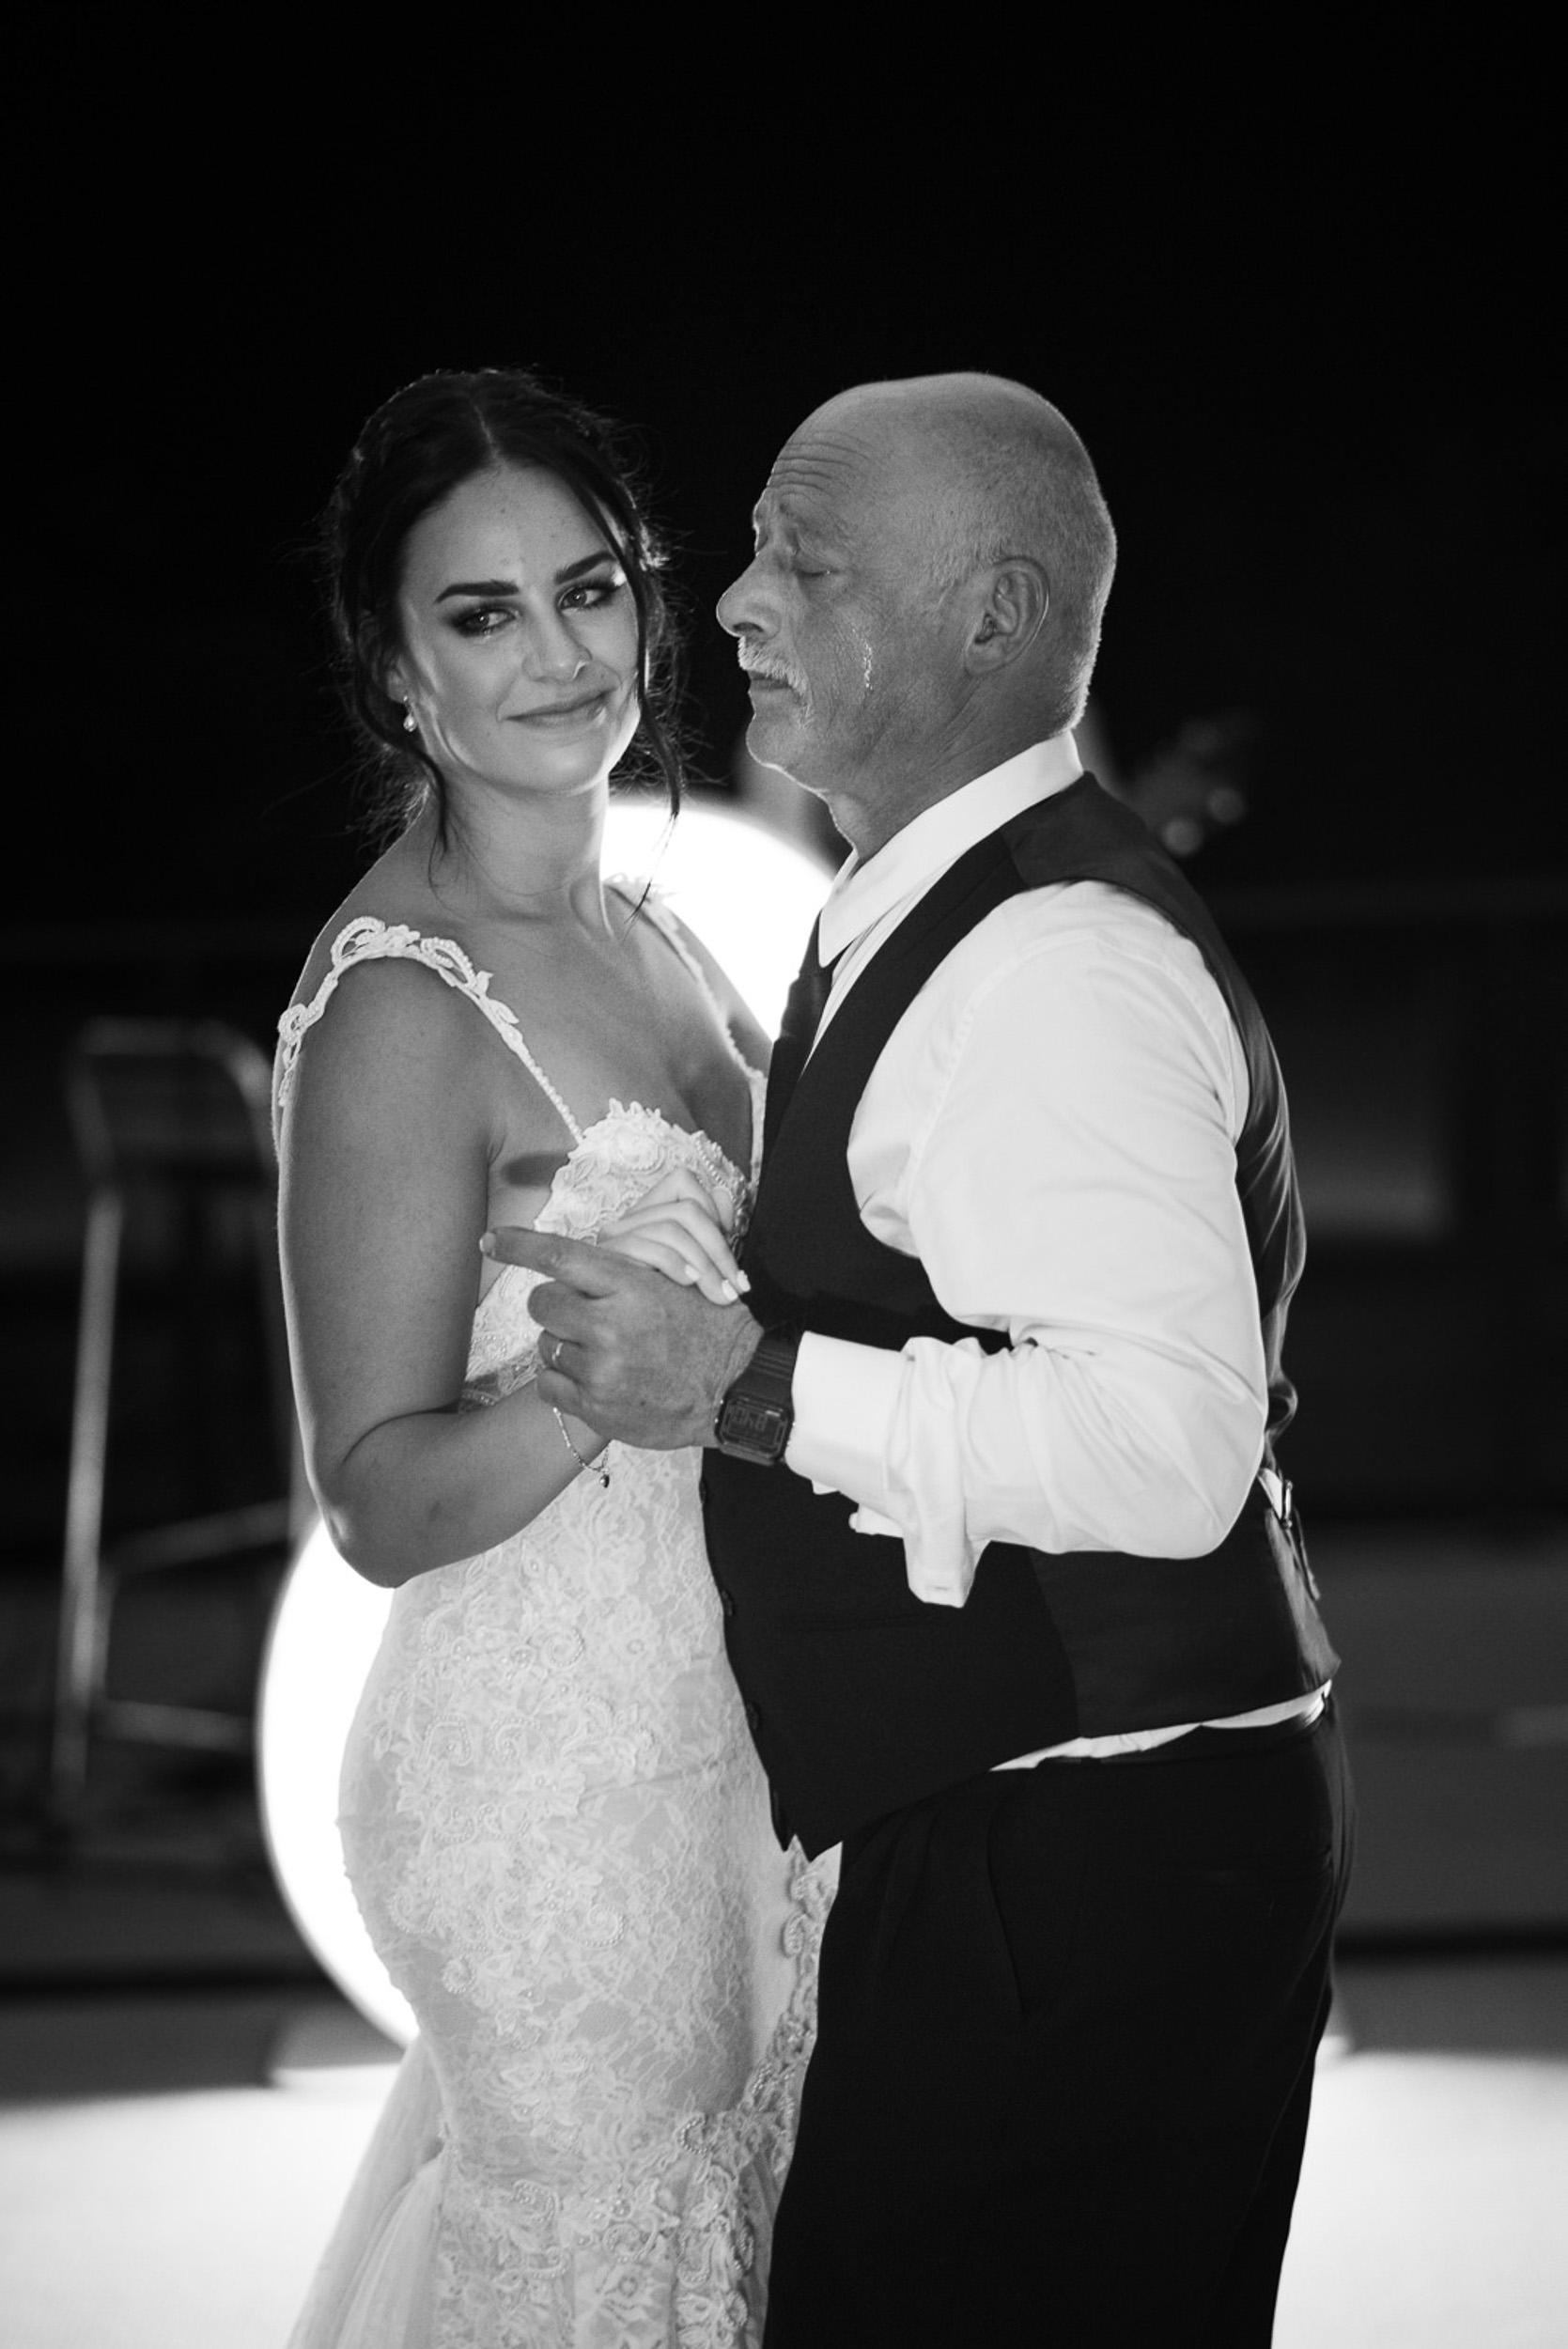 The Raw Photographer - Cairns Wedding Photographer - Fitzroy Island - Destination Wedding - Bride Dress - Groom Portrait - Queensland-49.jpg